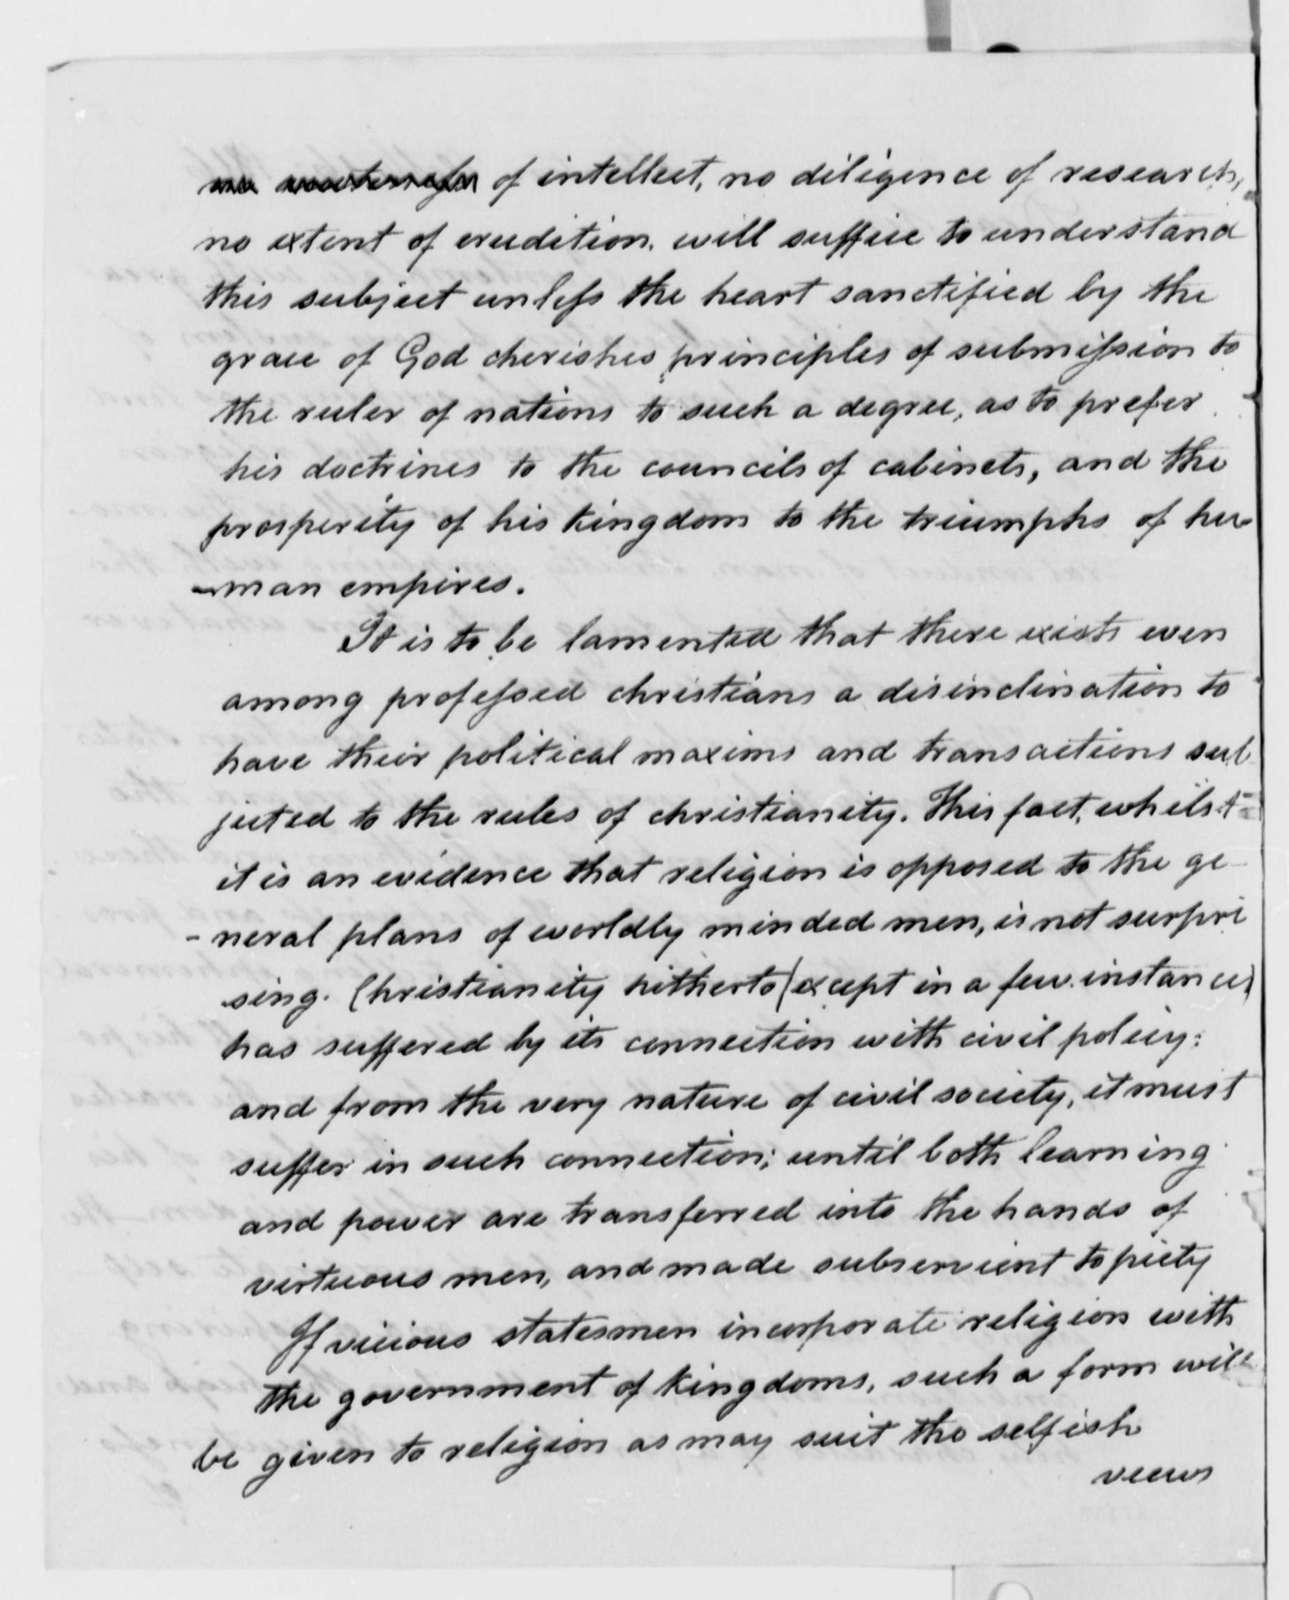 George Logan to Thomas Jefferson, October 16, 1816